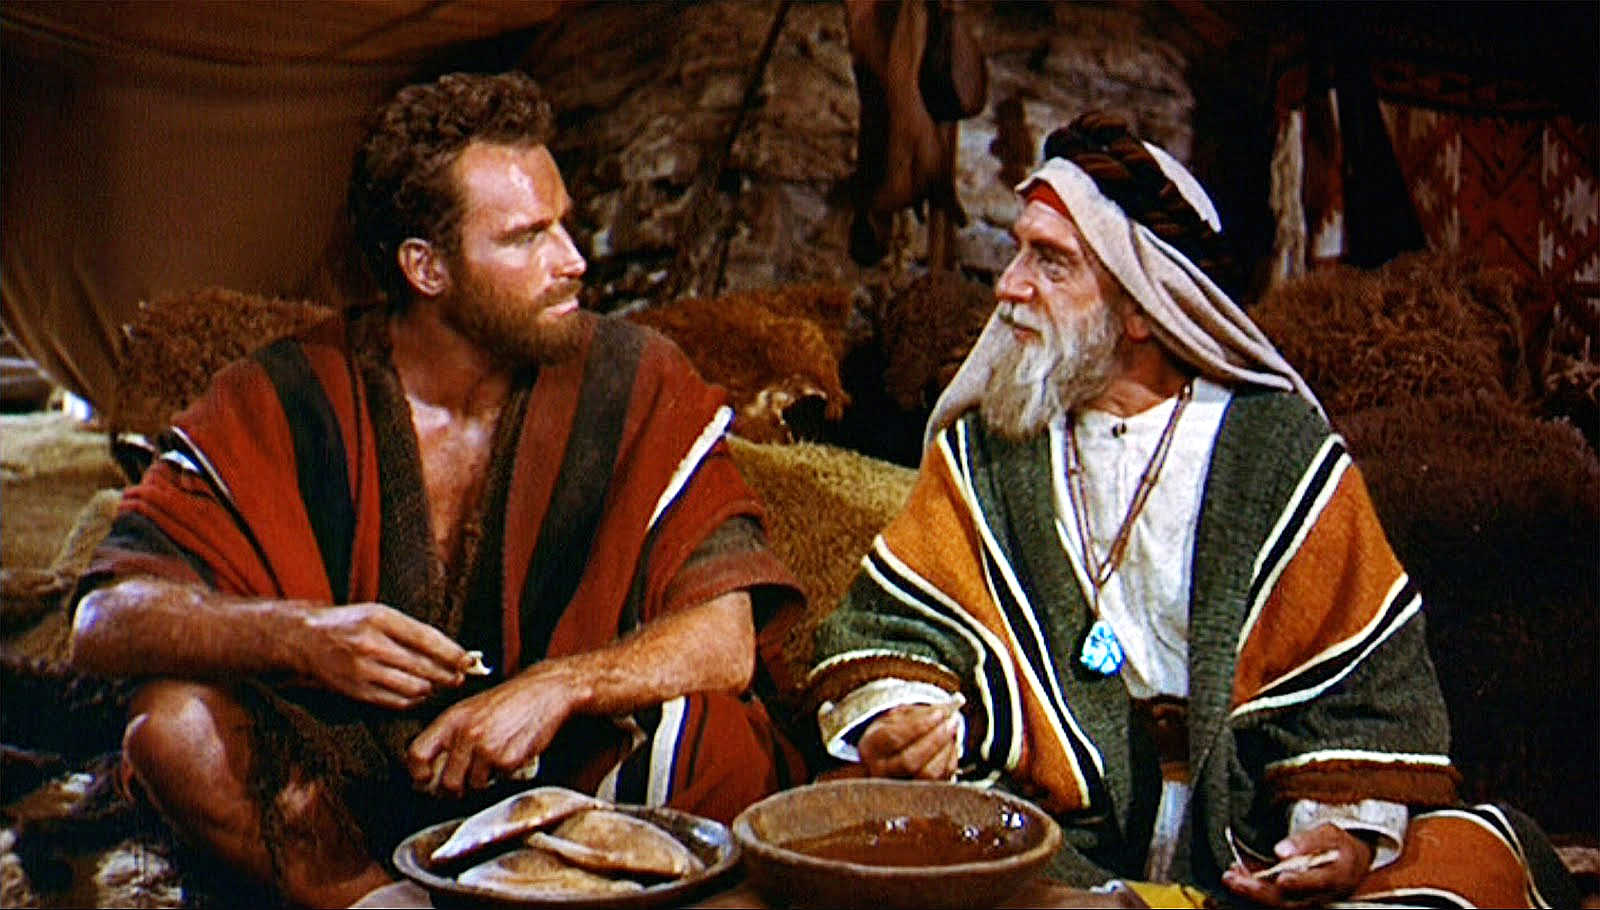 10 commandments movie 1956 online dating 8